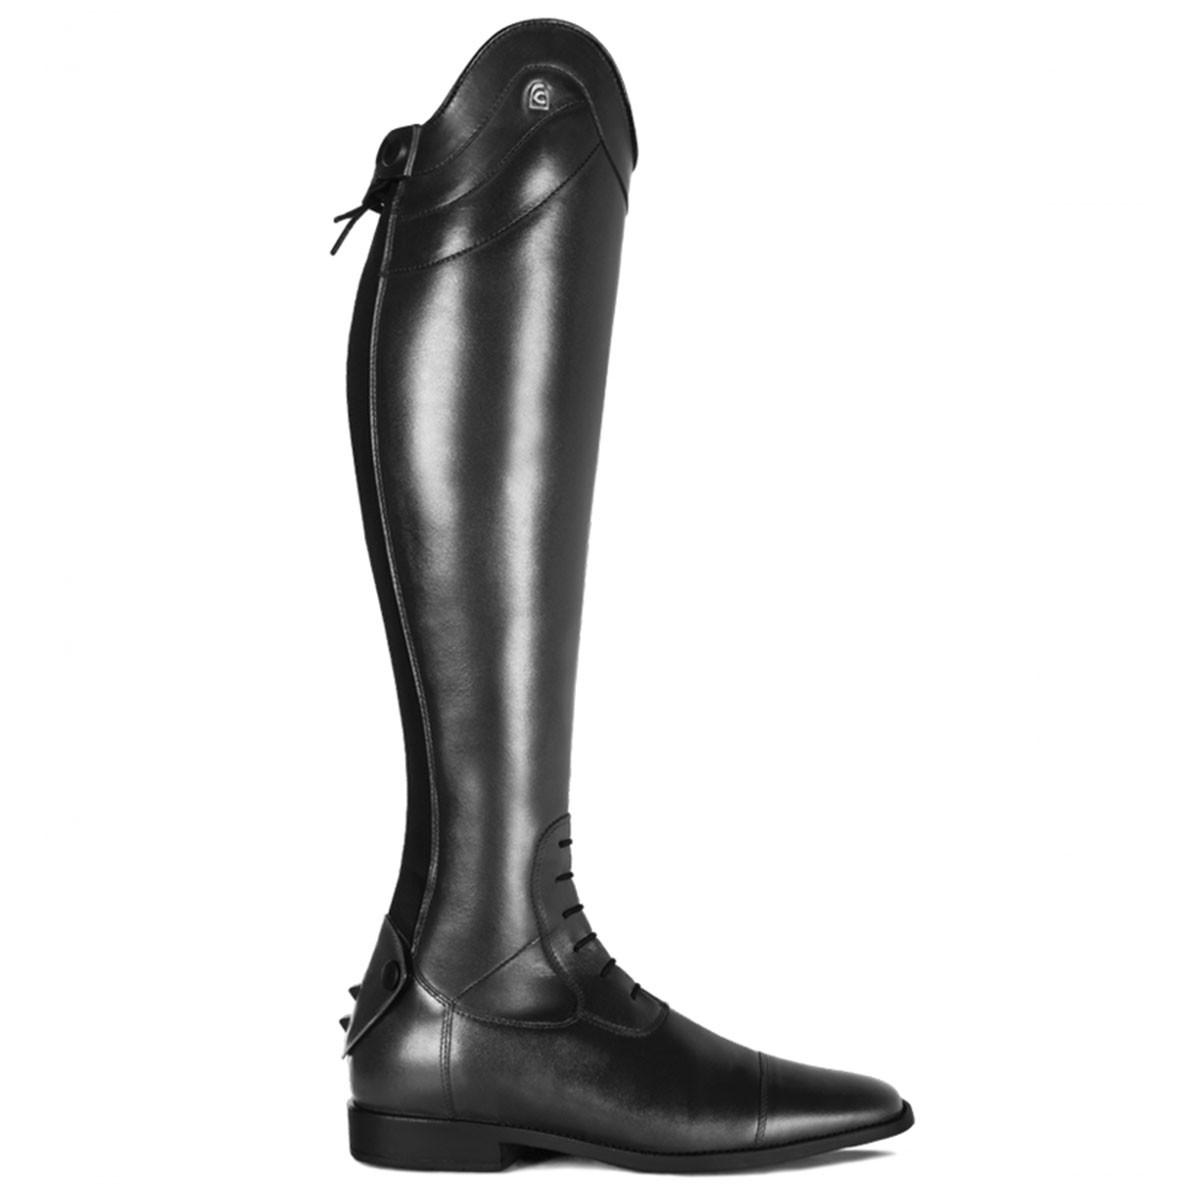 Cavallo Linus Slim rijlaars zwart maat:5-5.5 / h47-w35